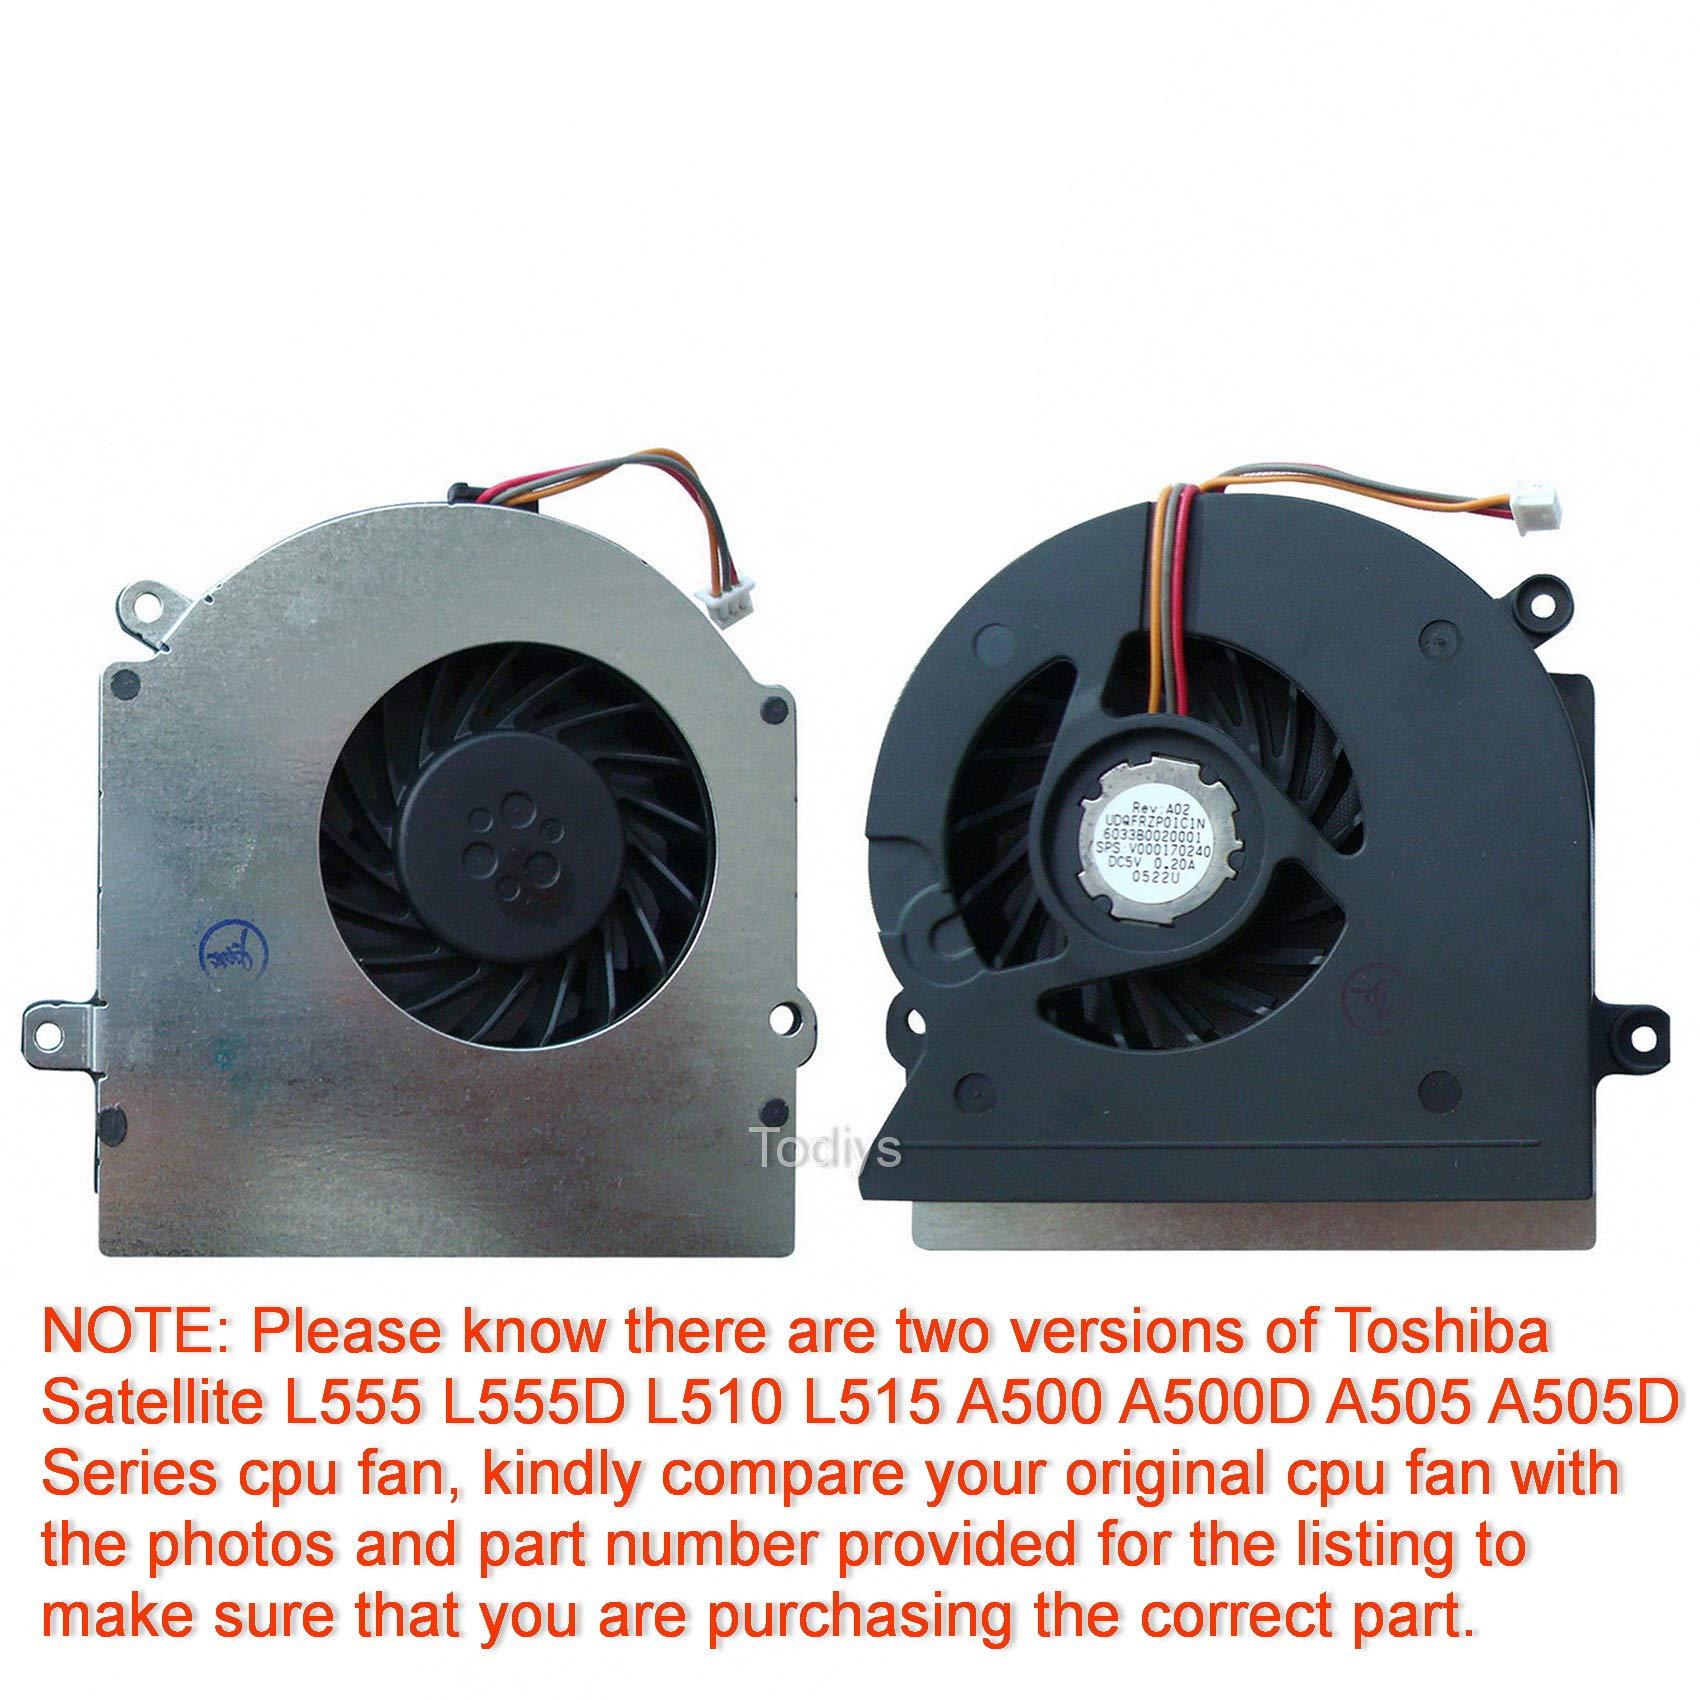 Cooler Para Toshiba Satellite L555 L555d L510 L515 A500 A500d A505 A505d Series L555-10n L555d-s7005 L510-00y L515-s4960